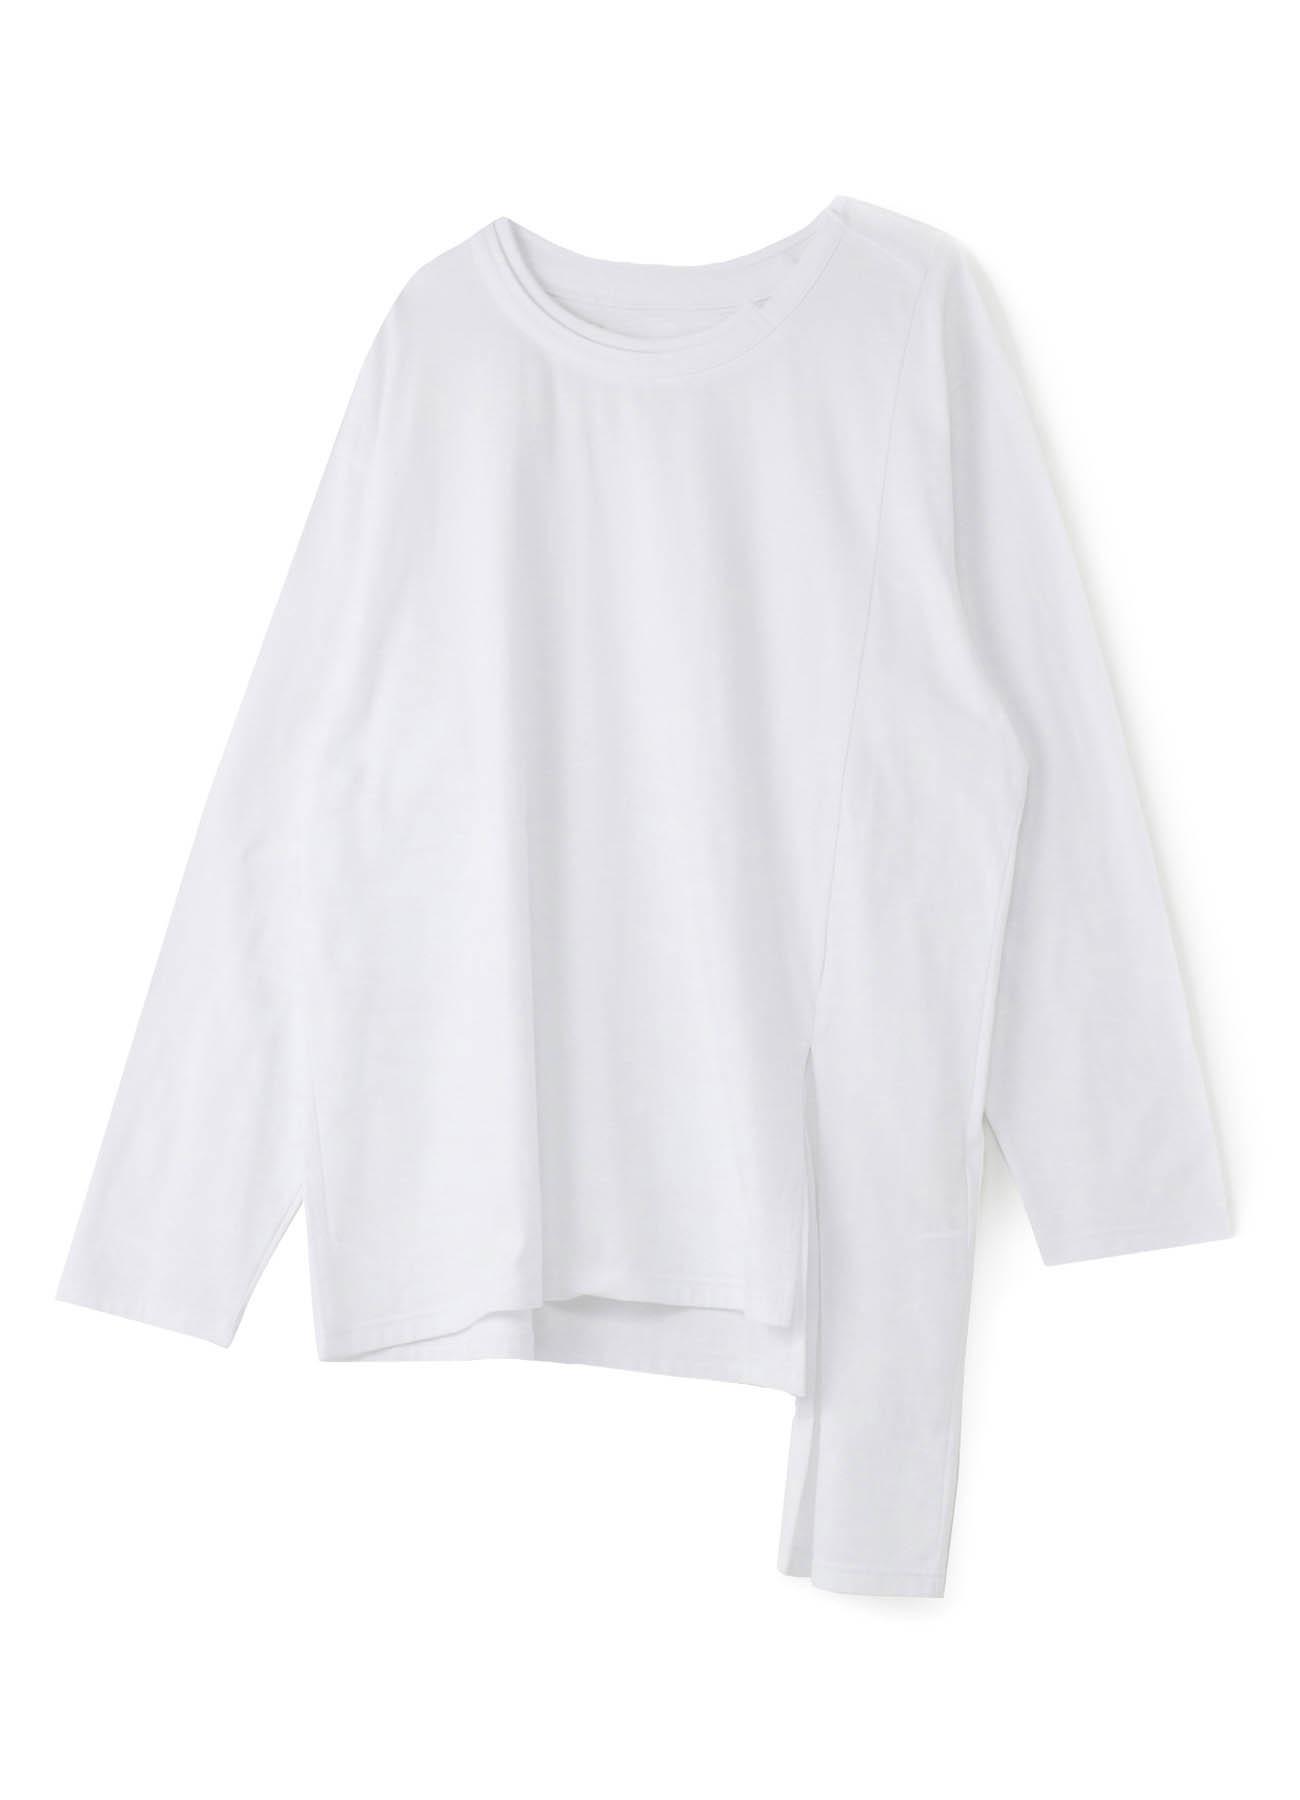 30 Cotton Plain Stitch不对称剪裁和缝制长袖